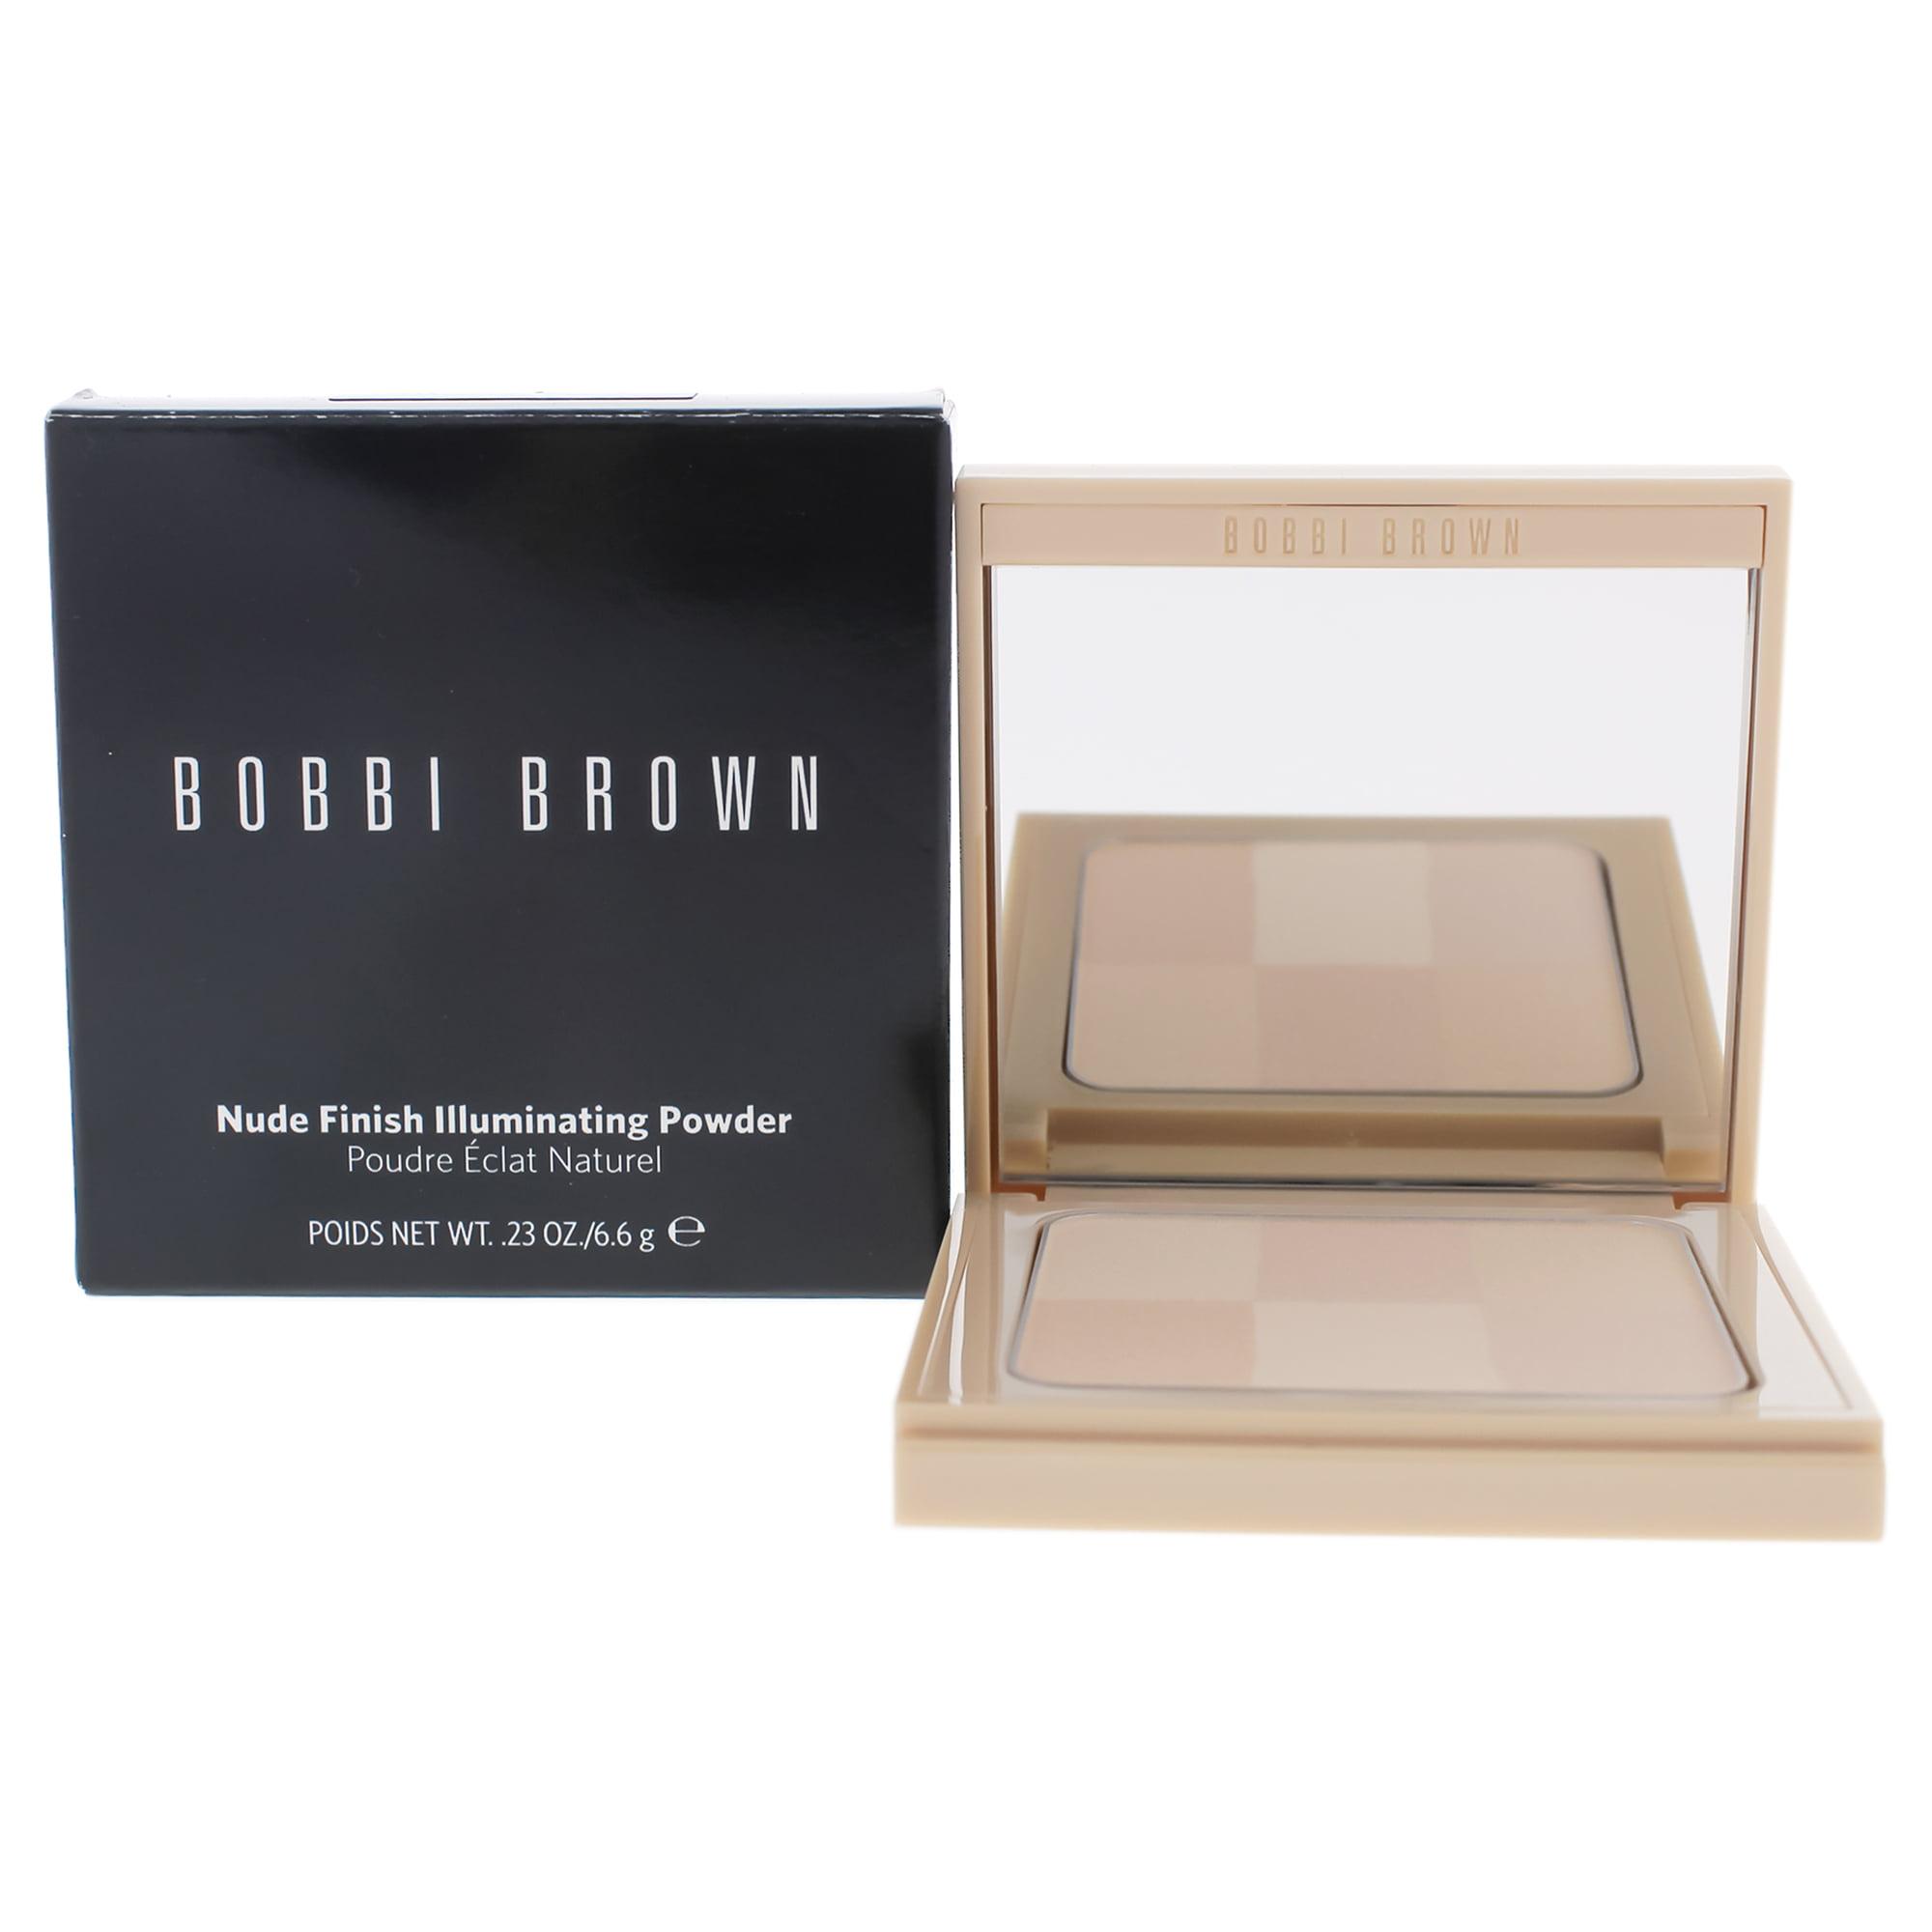 Bobbi Brown Nude Finish Illuminating Powder - Bare | Face Powder | Beauty - Shop Your Navy